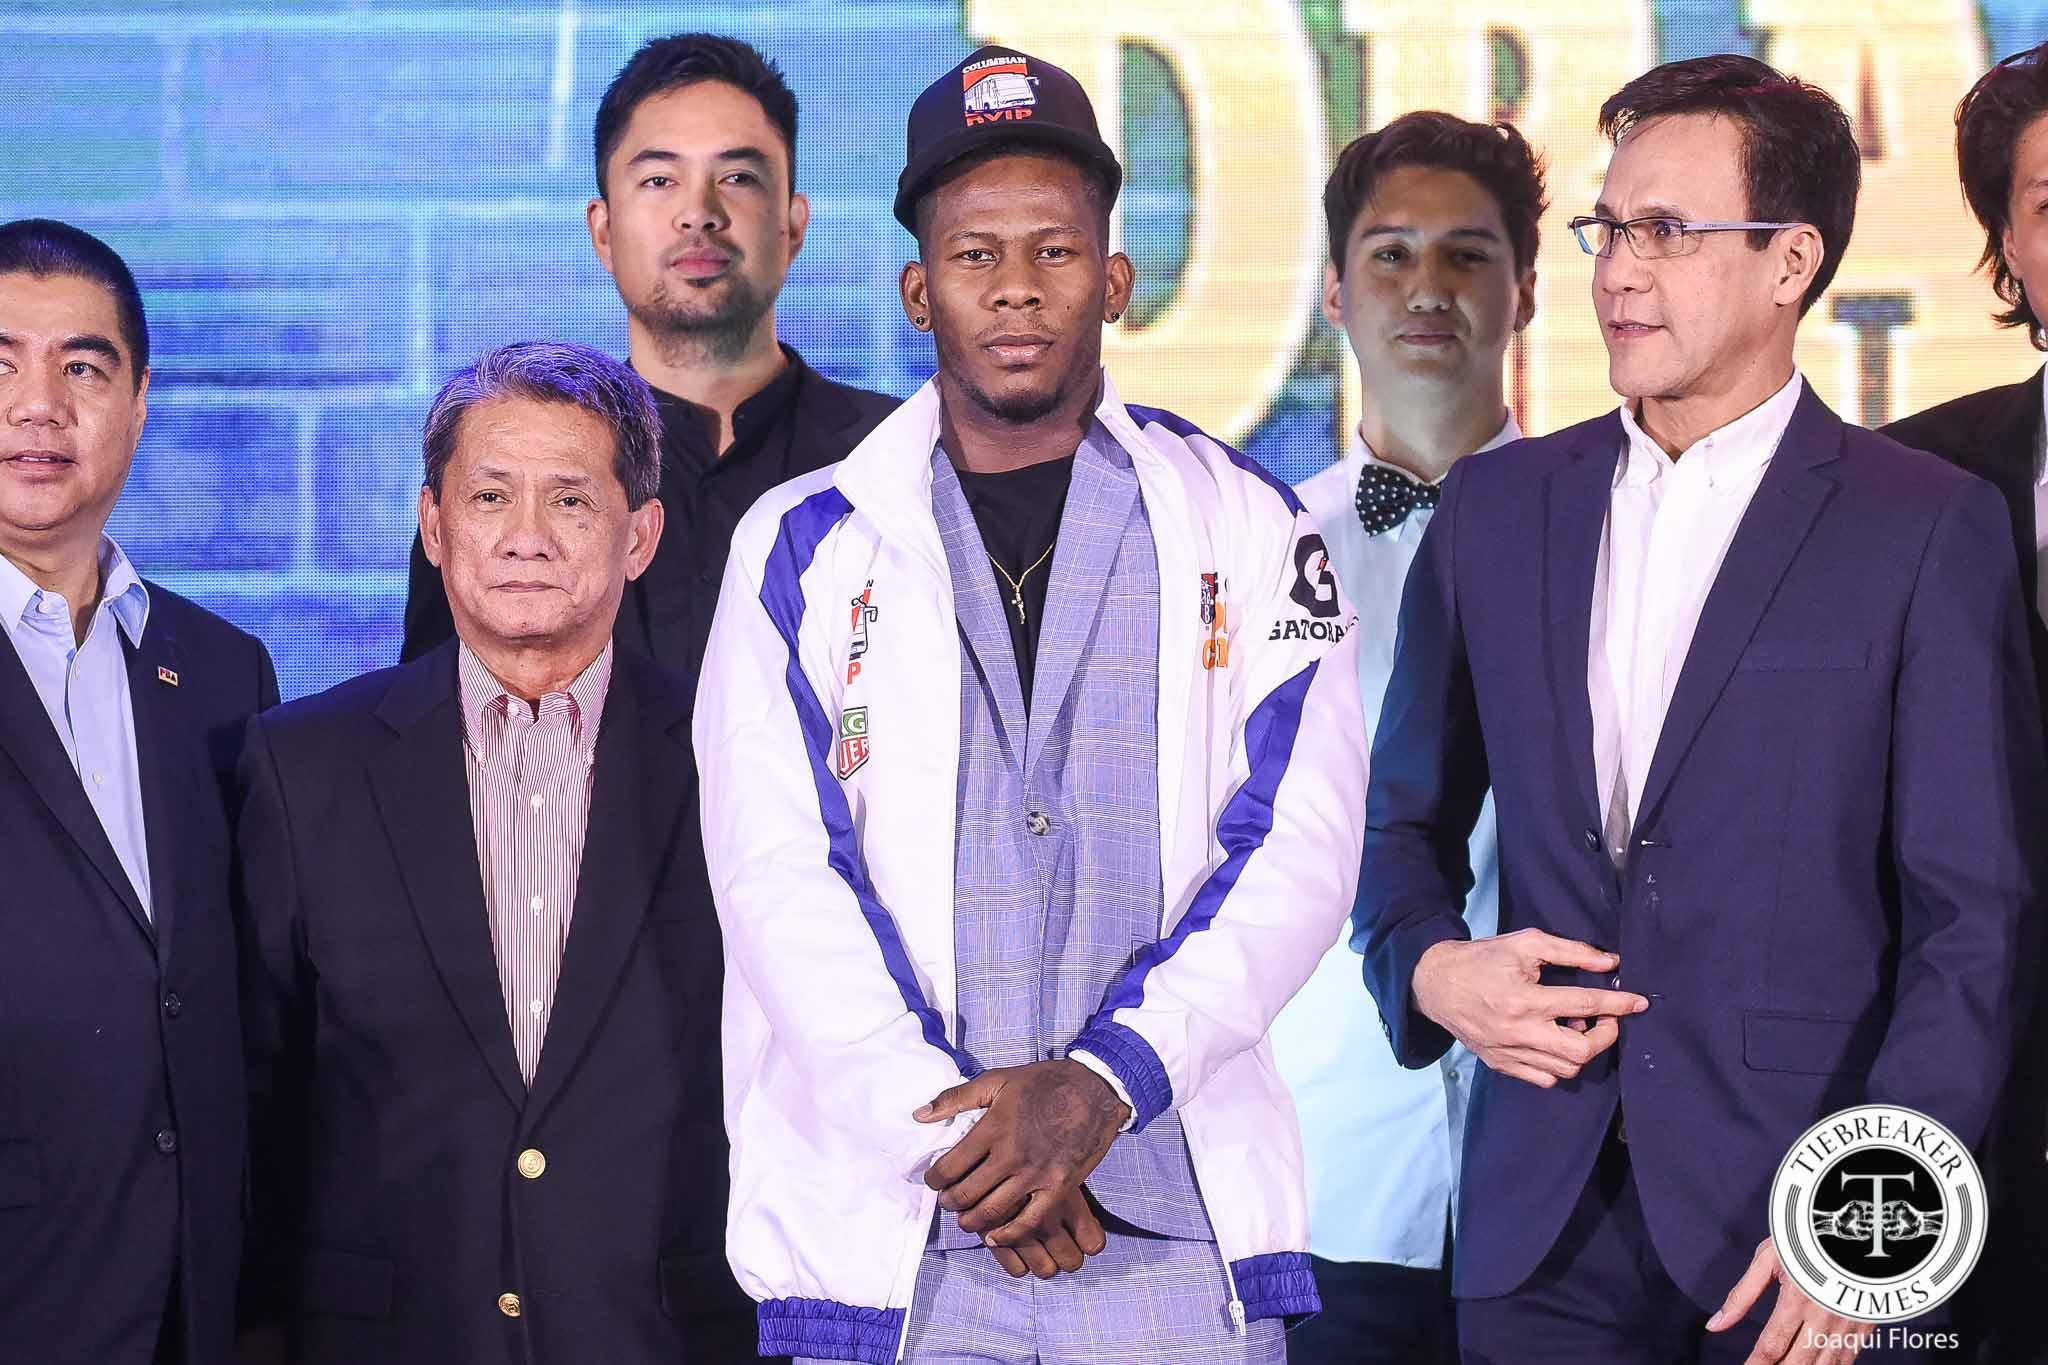 PBA-Draft-CJ-Perez-8796 Perez proposal to SMB follows same formula as Standhardinger trade of 2017 Basketball News PBA  - philippine sports news